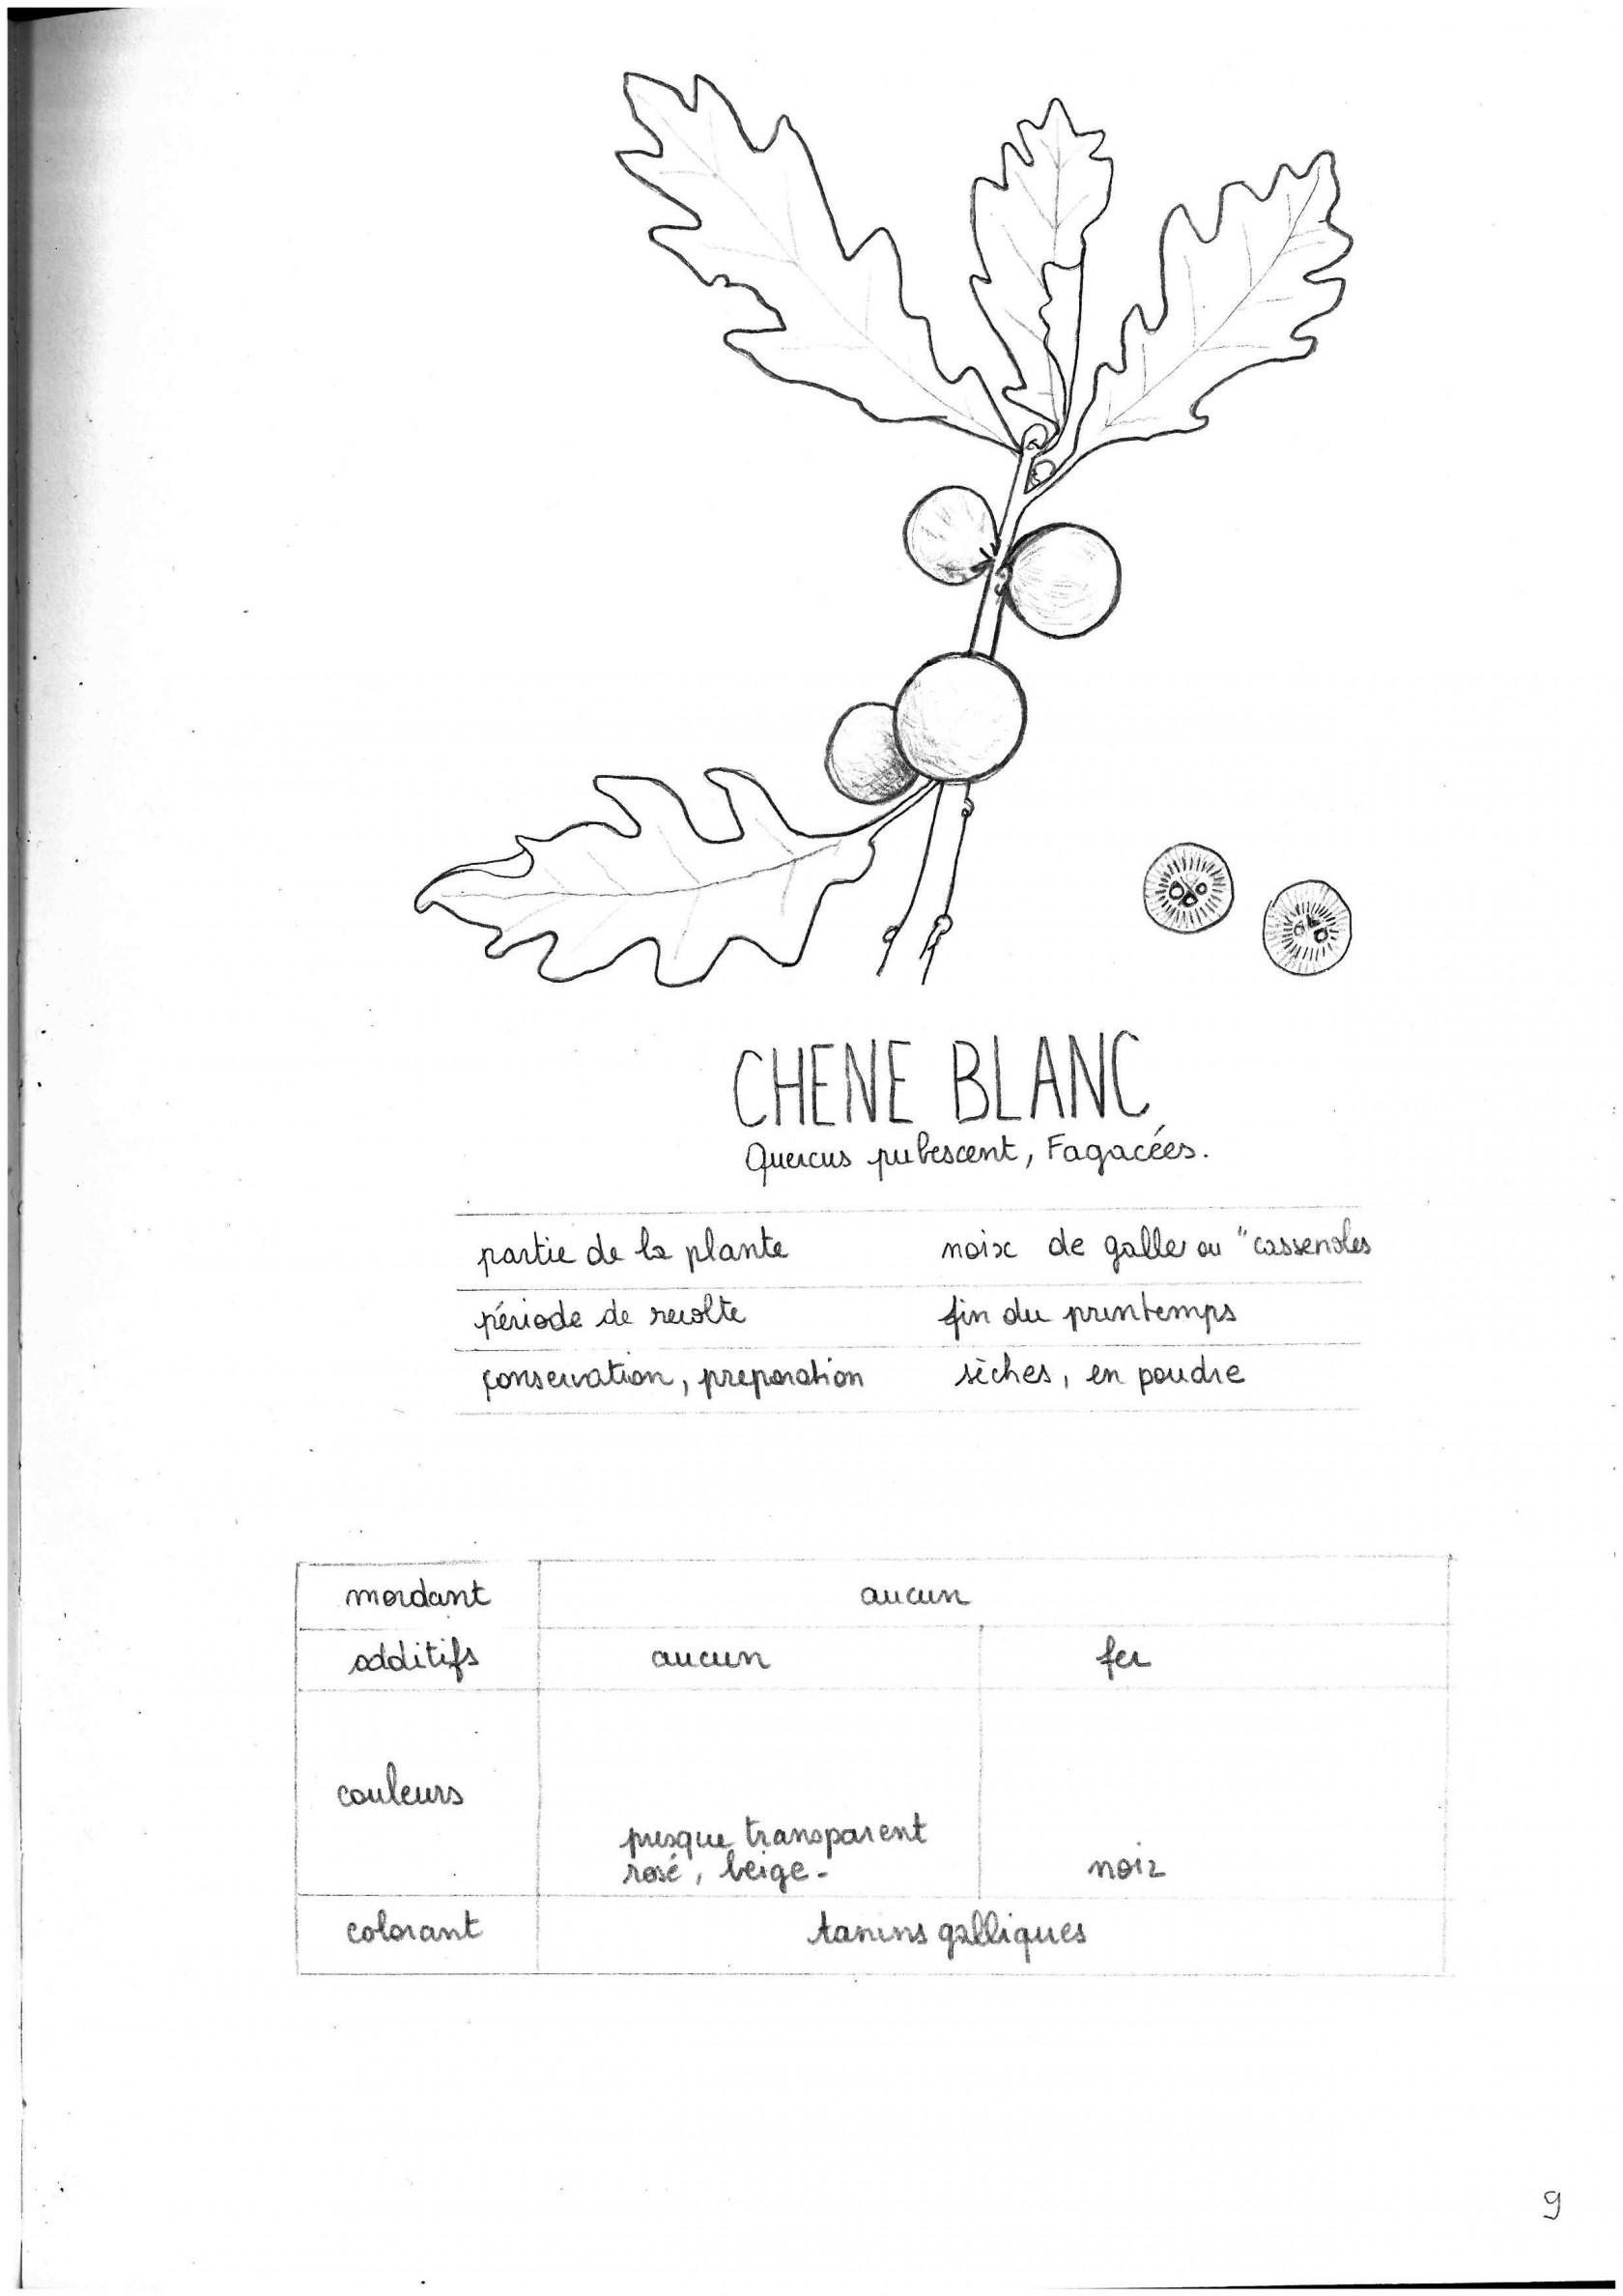 cheneblancp9.jpg